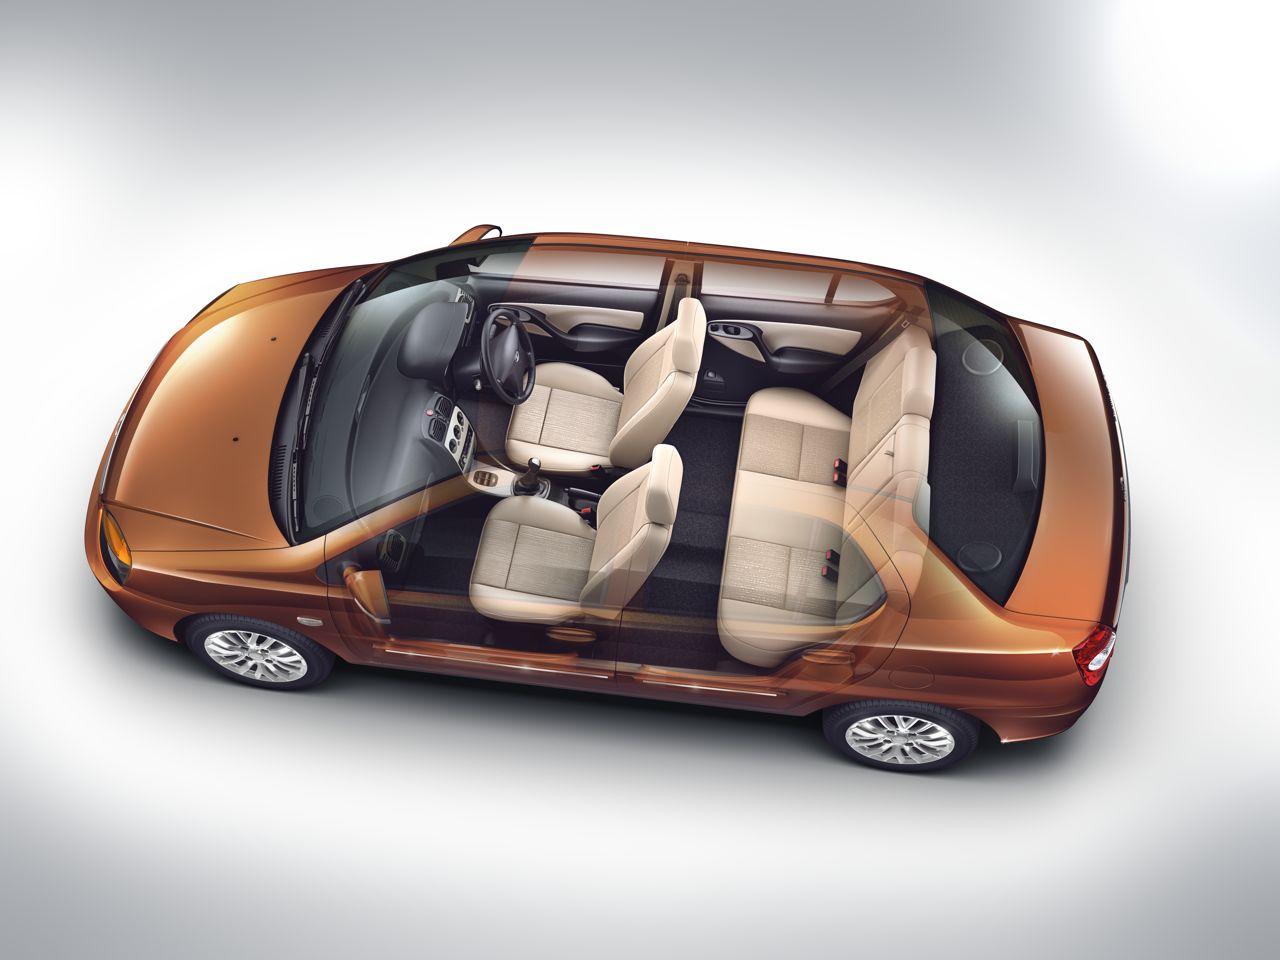 2013 Tata Indigo eCS seating